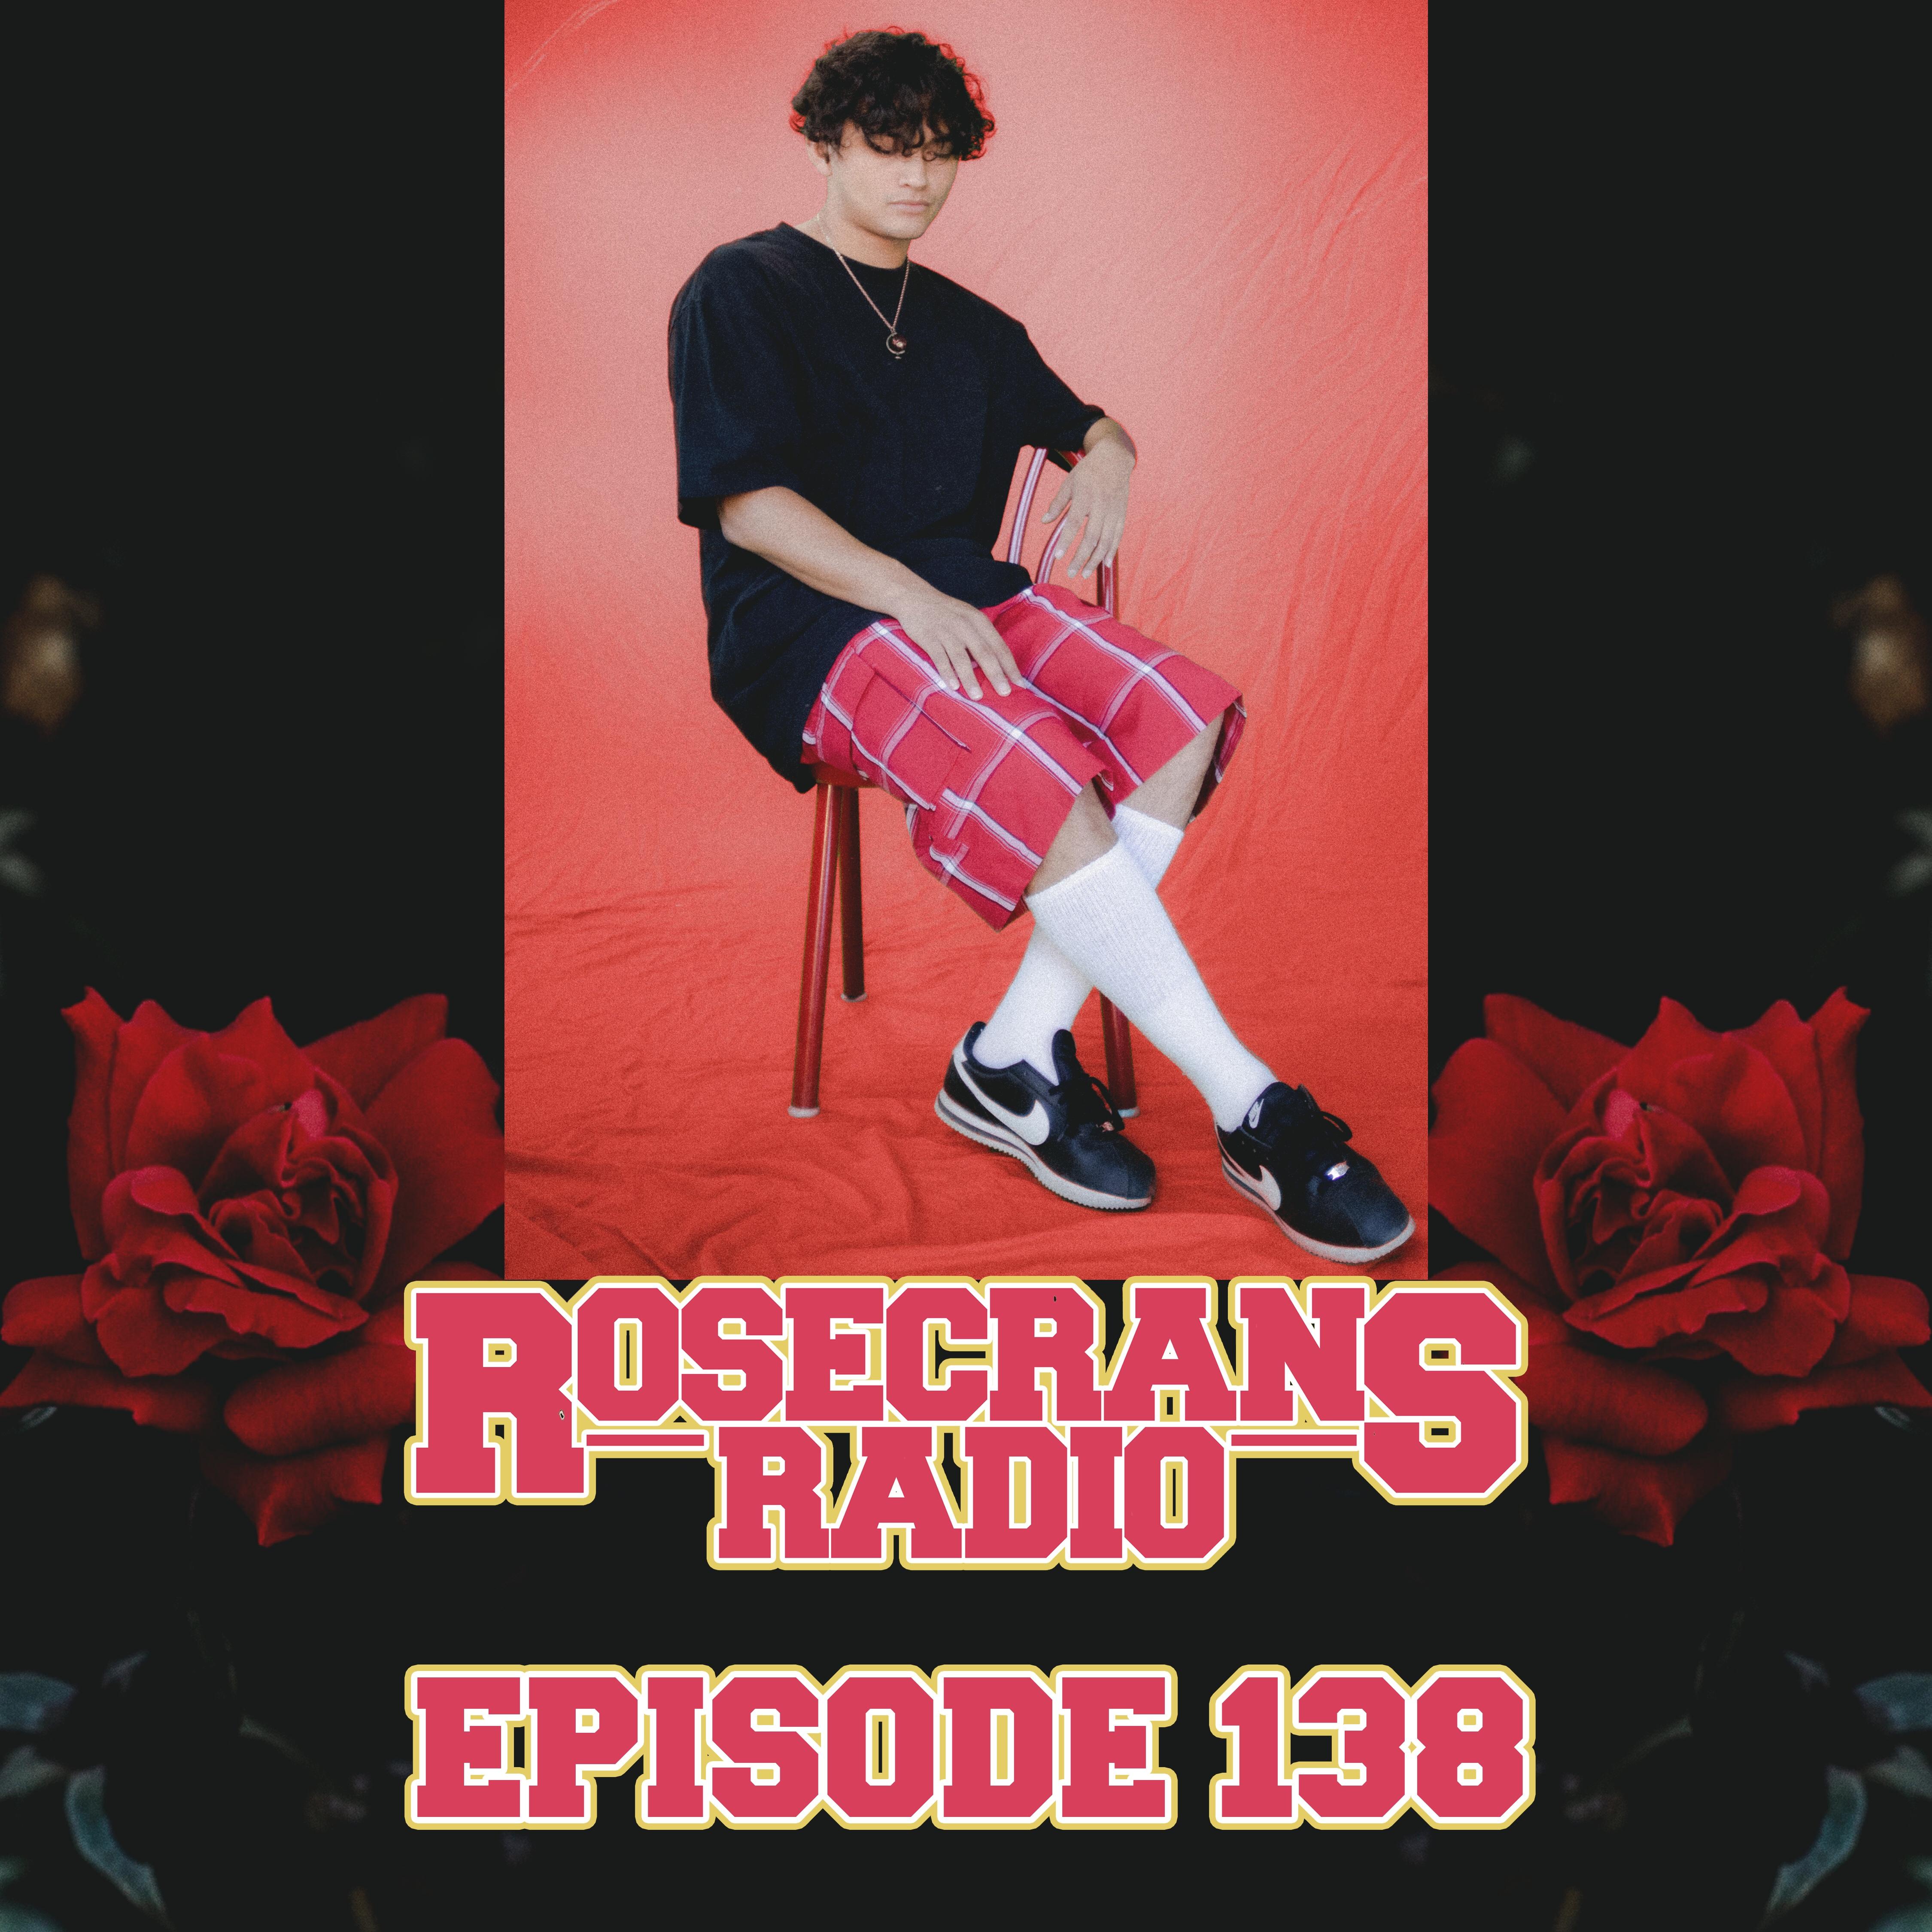 Rosecrans Radio Interviews IhateyouALX